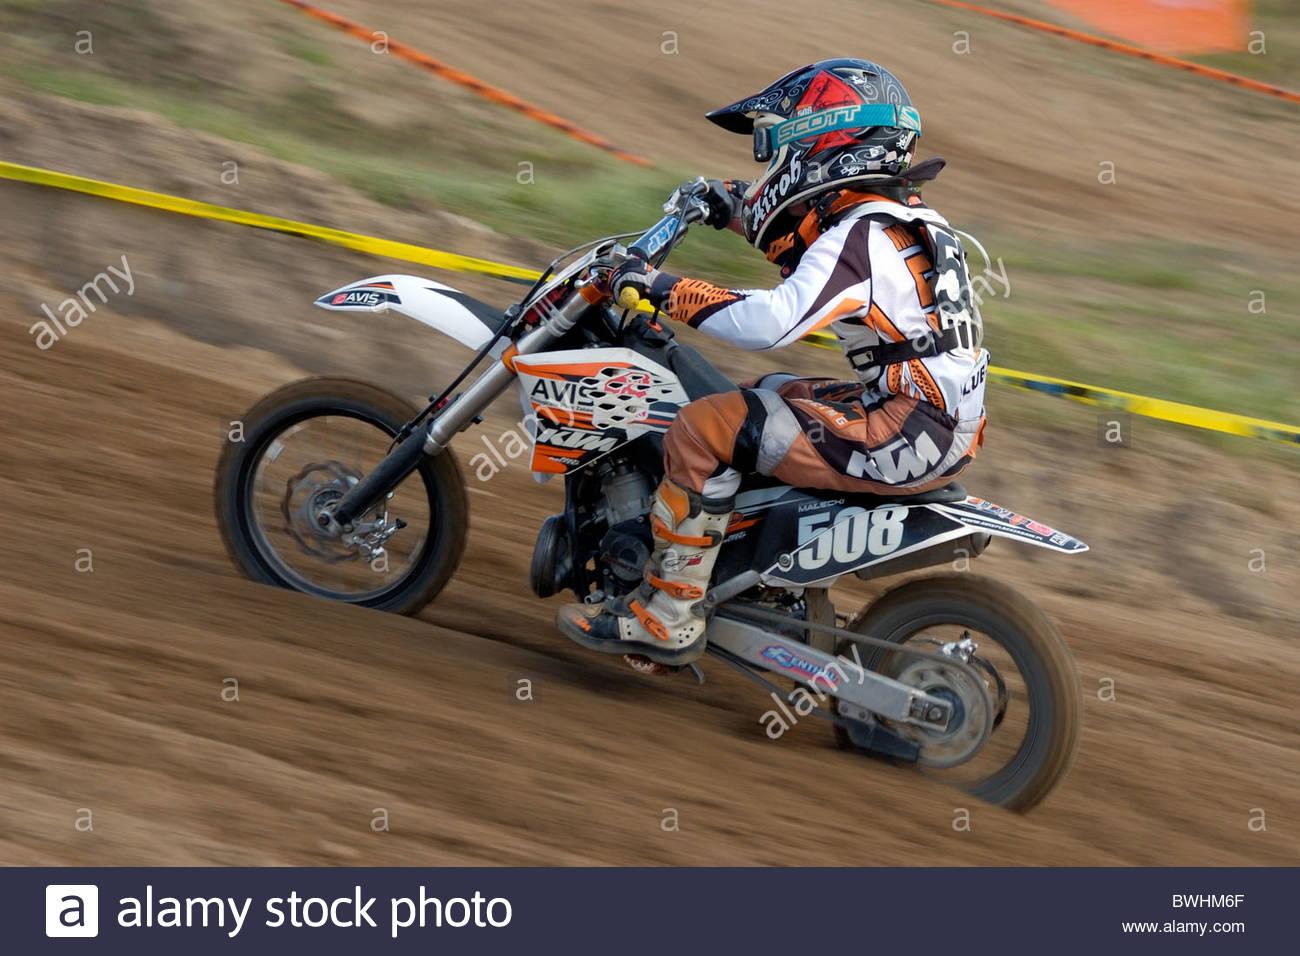 2010 Motocross Championship Czluchow, Poland. September 19 - Stock Image